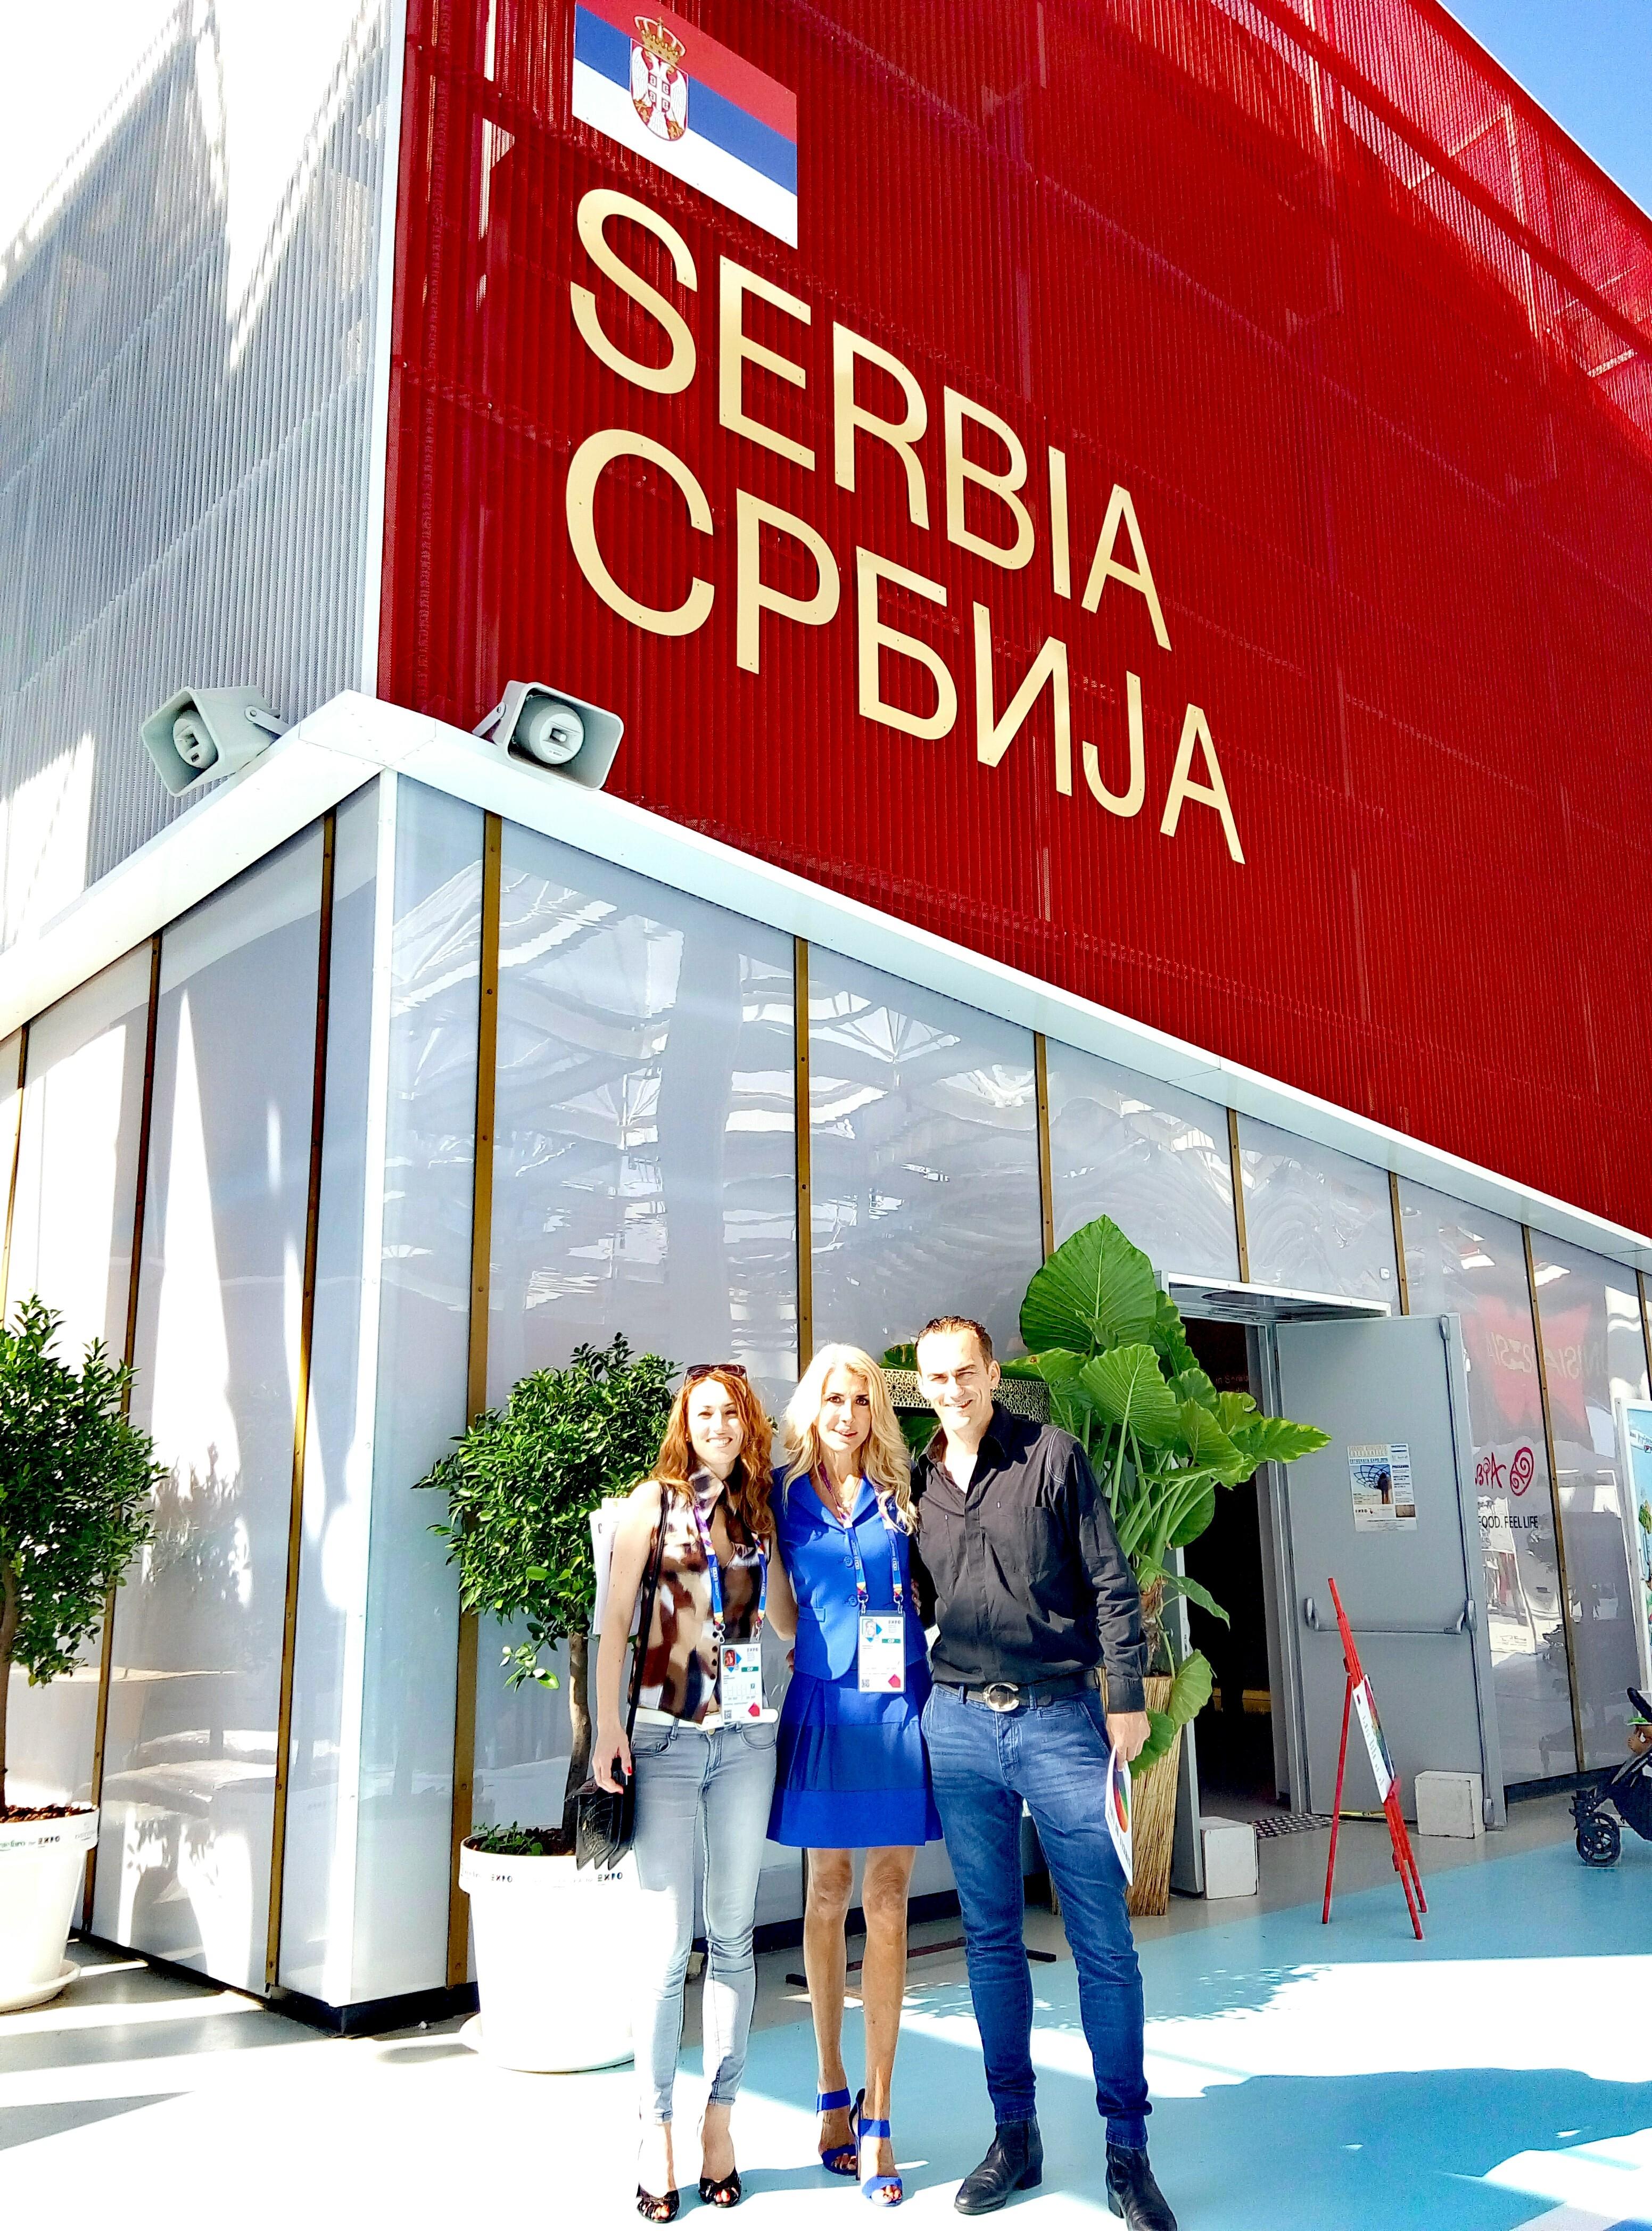 Circle of Life Milan, Ivana Ivka, Gabriella Carlucci, Marko Gavrilovic